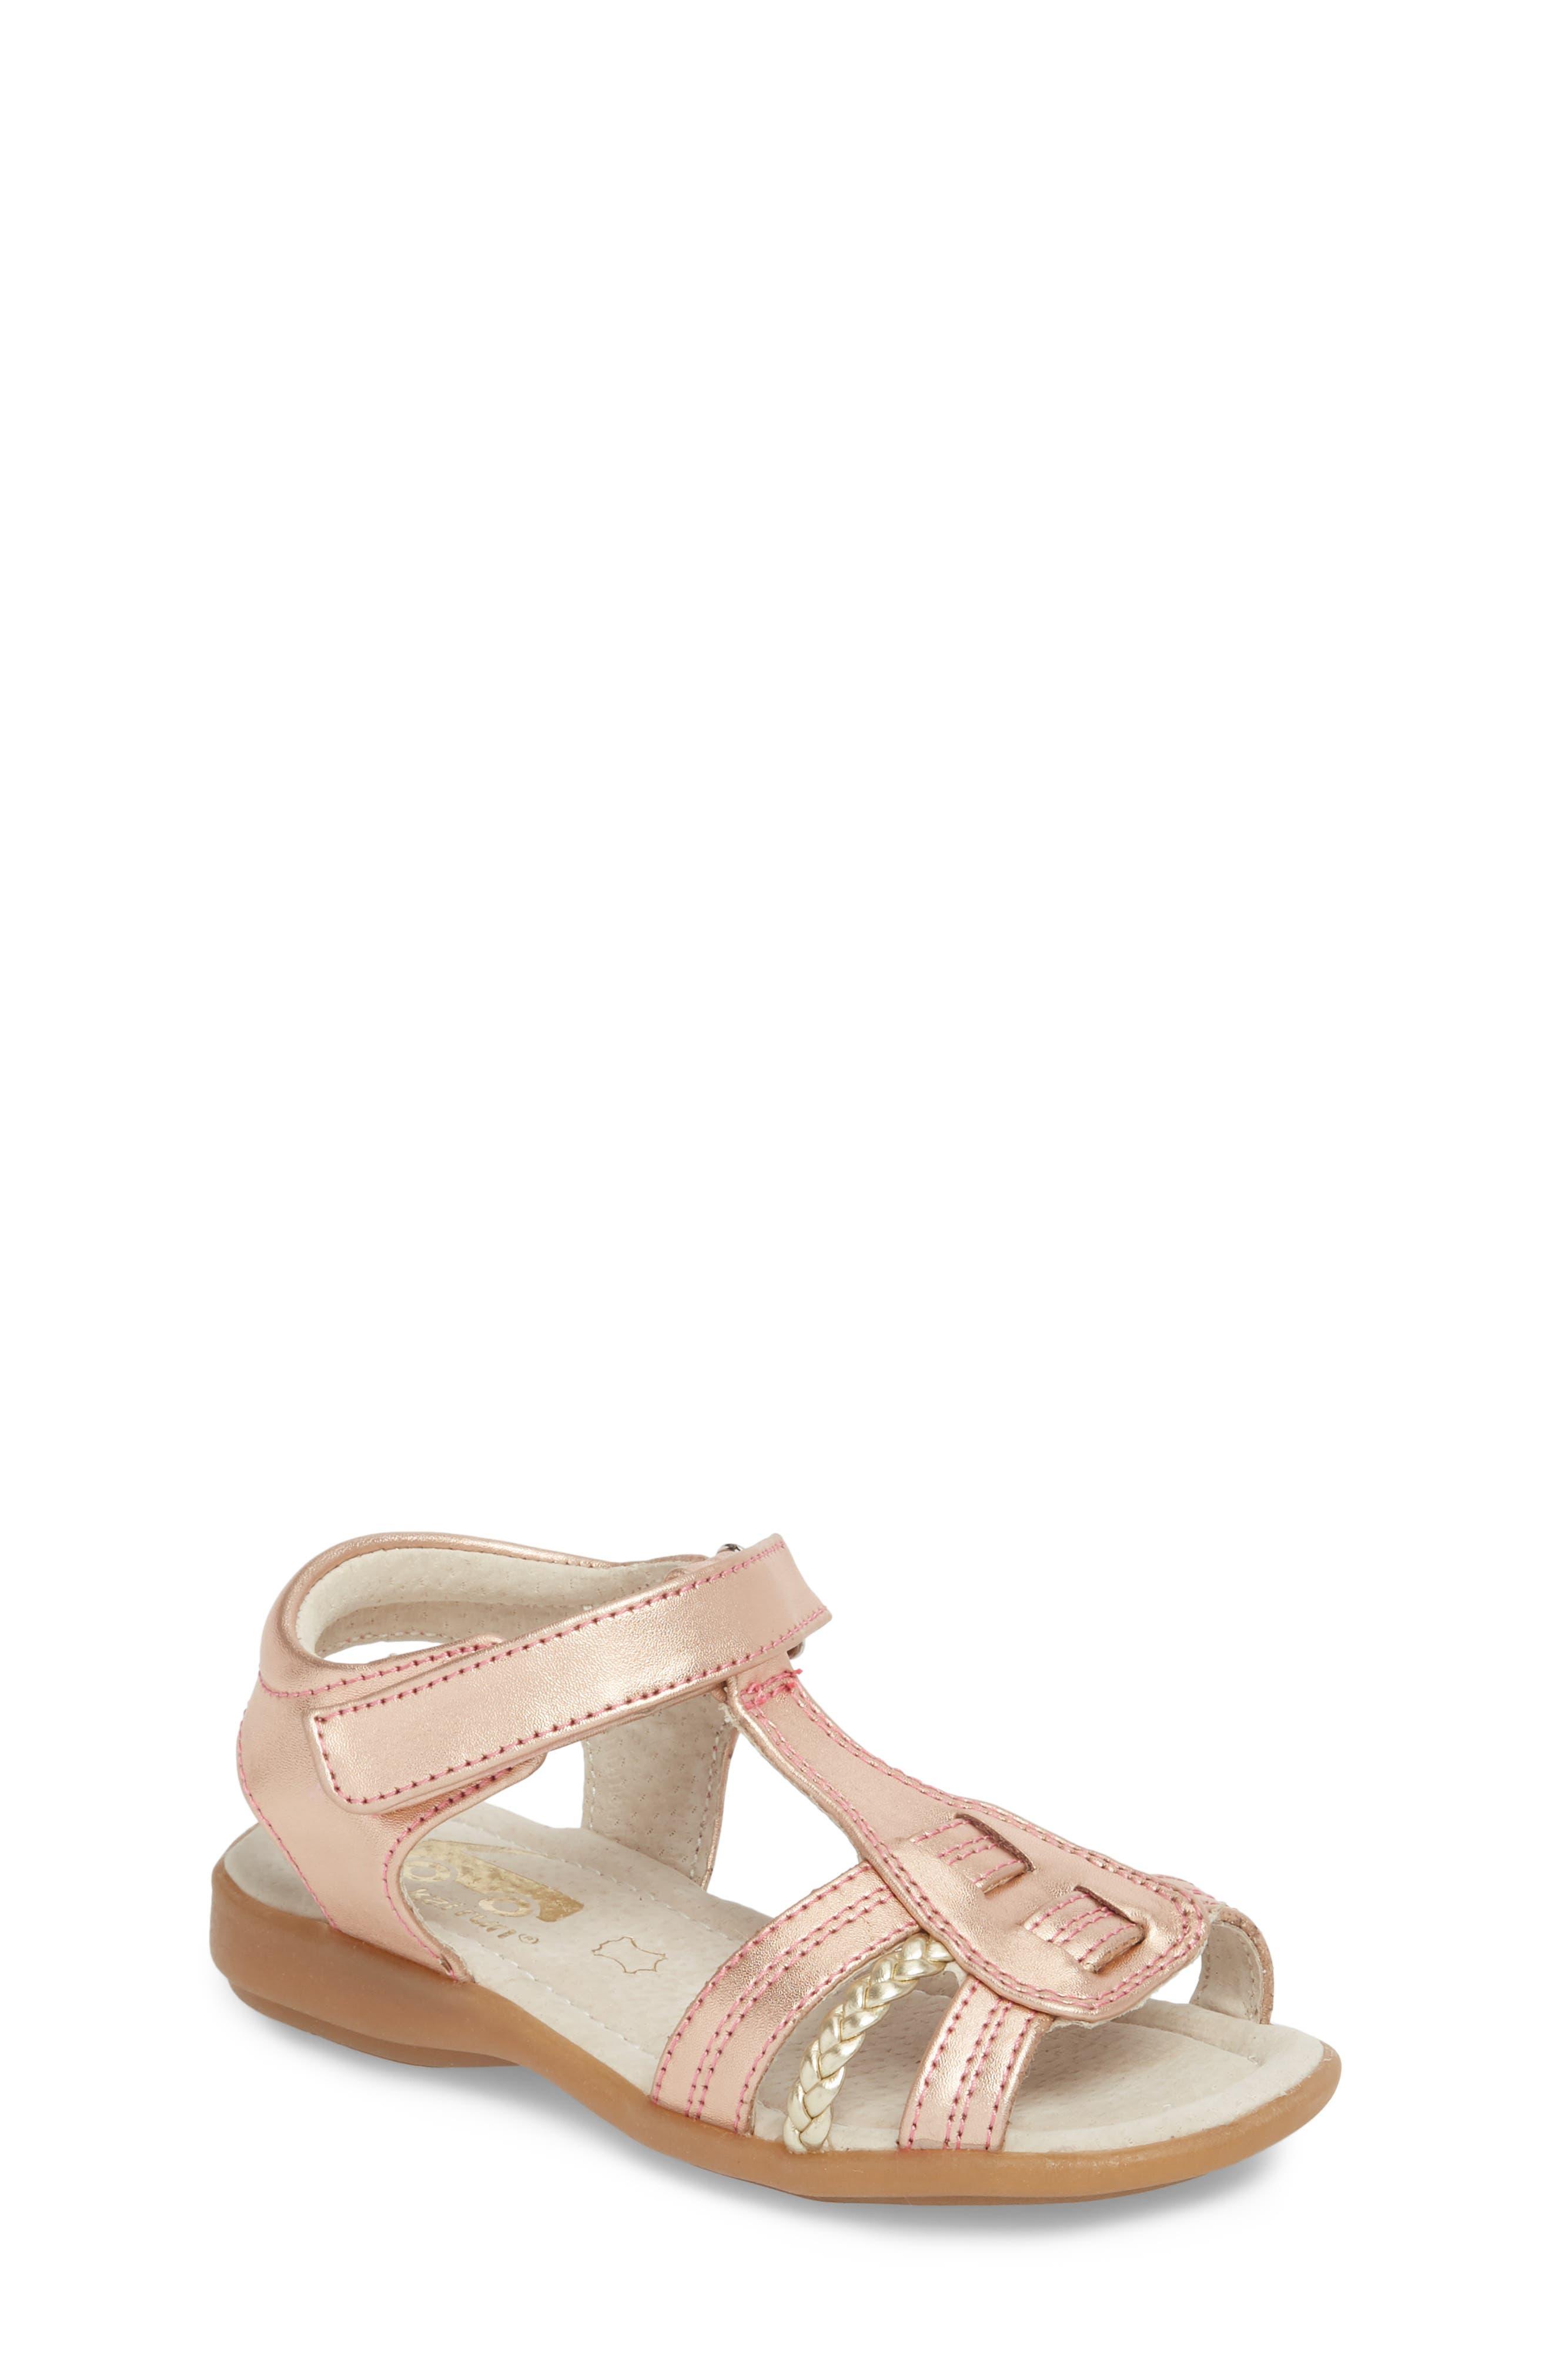 Hadley Metallic Sandal,                         Main,                         color, Rose Gold